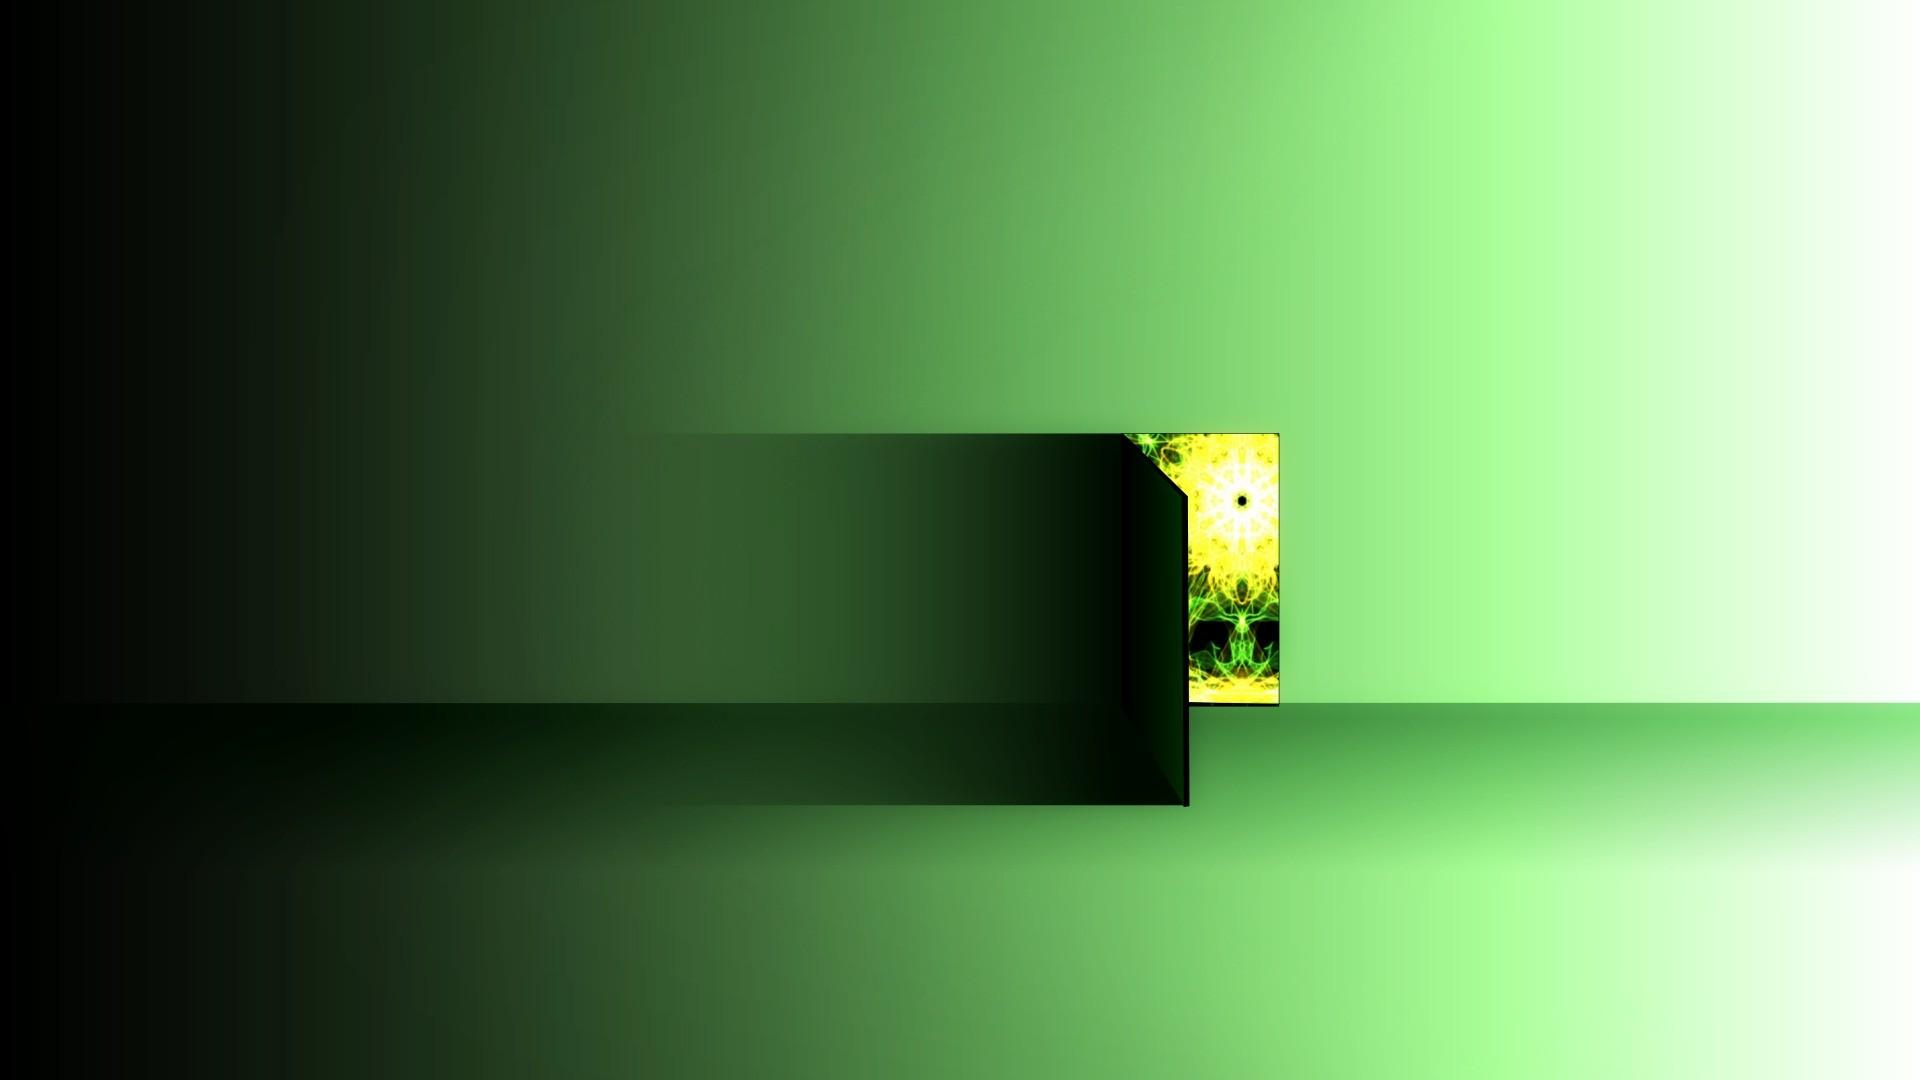 Akai shoku the door2